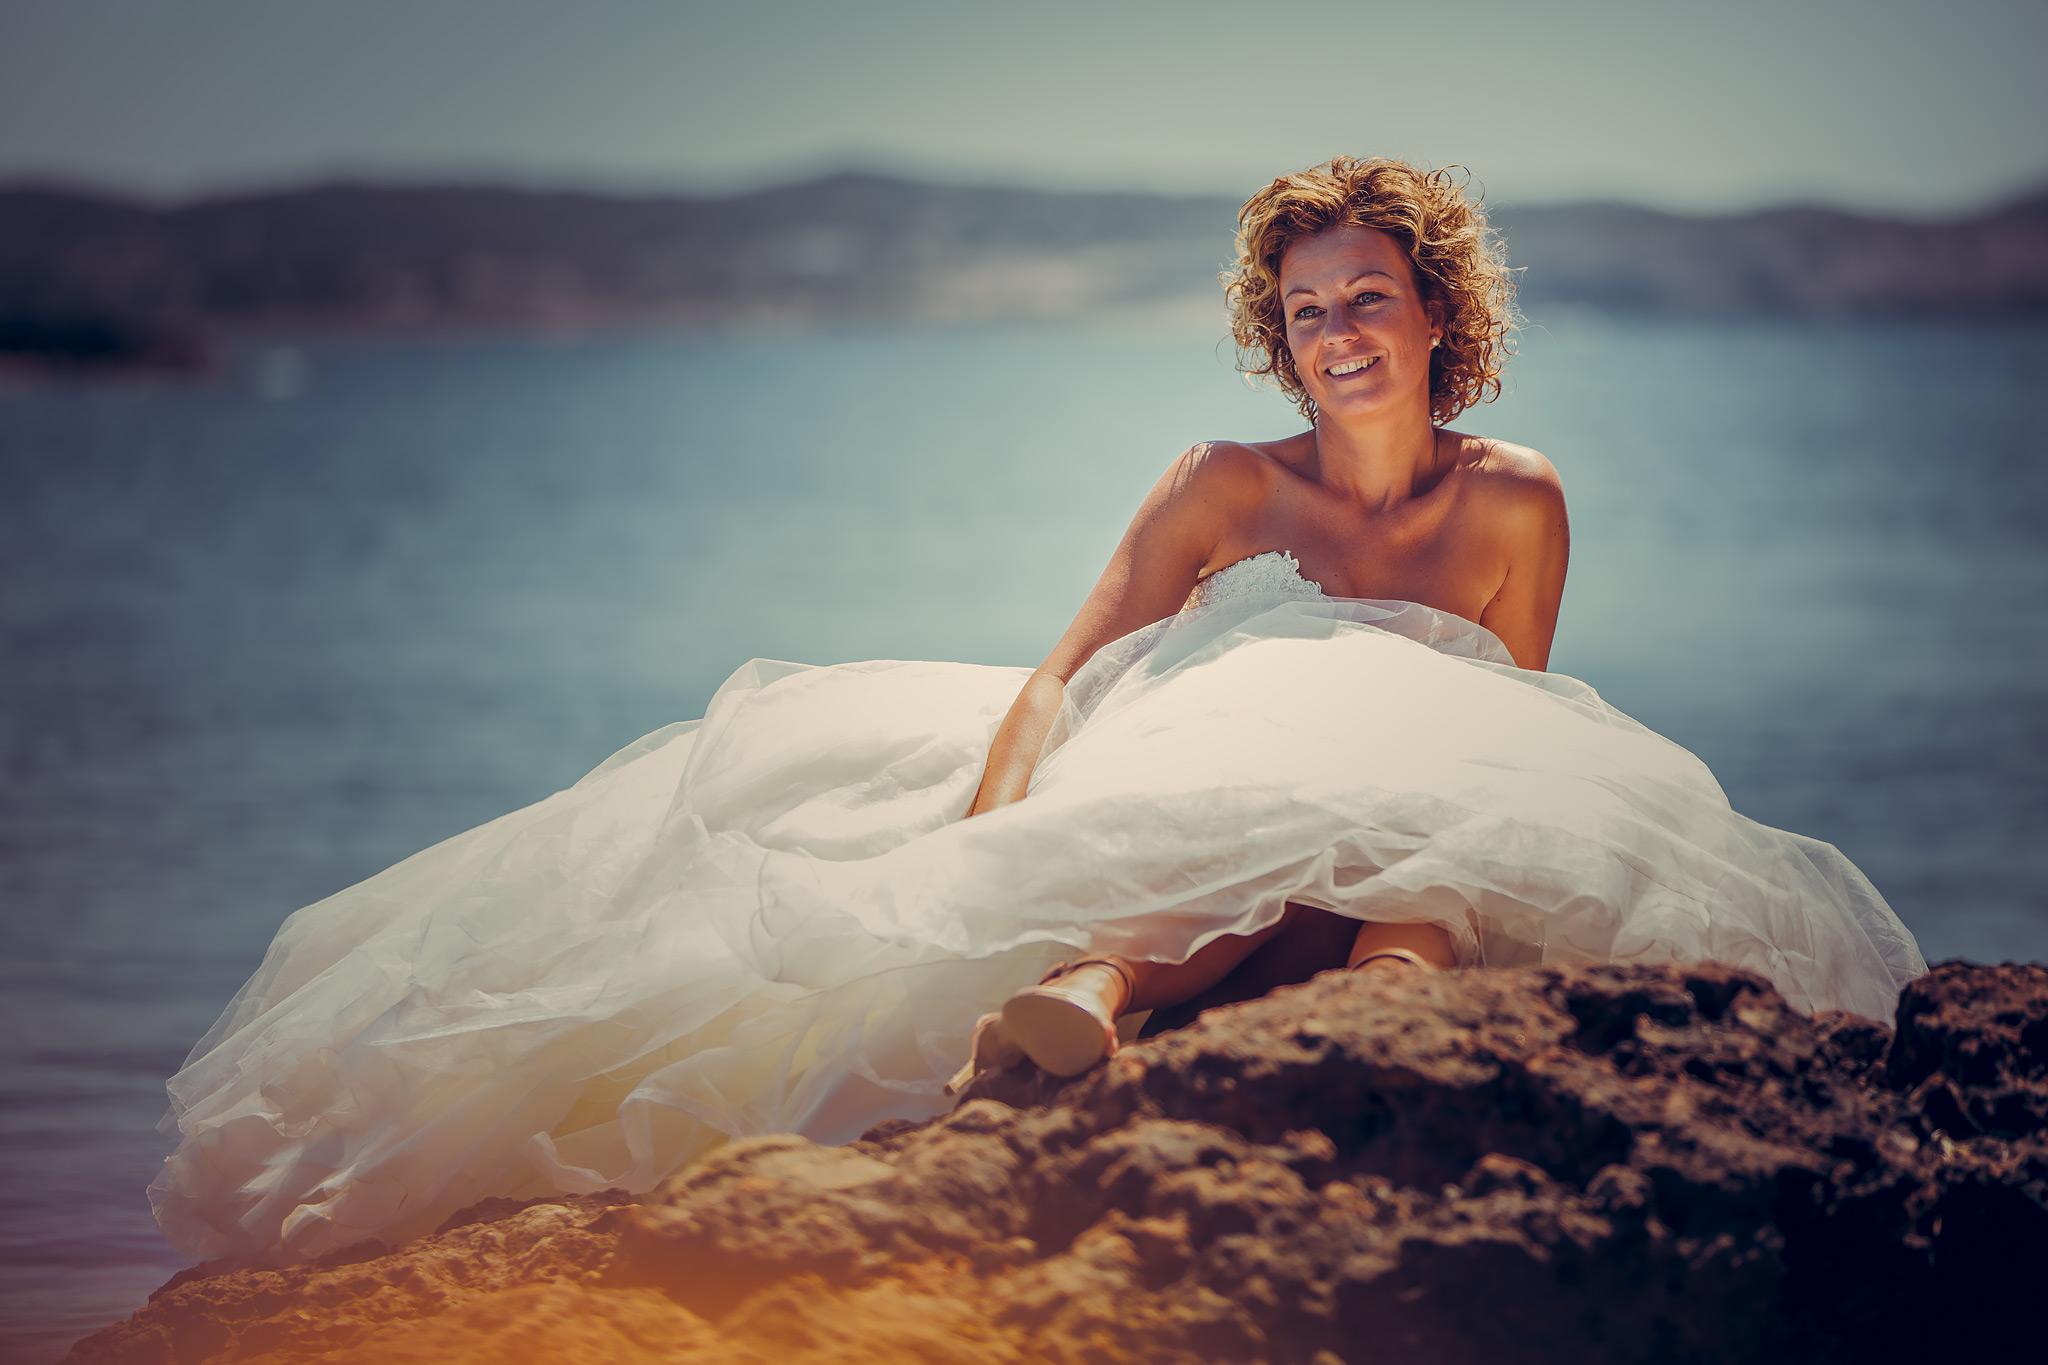 Bruidsreportage Destination Wedding Ibiza Mandy en Joost 019 - Bas Driessen Fotografie